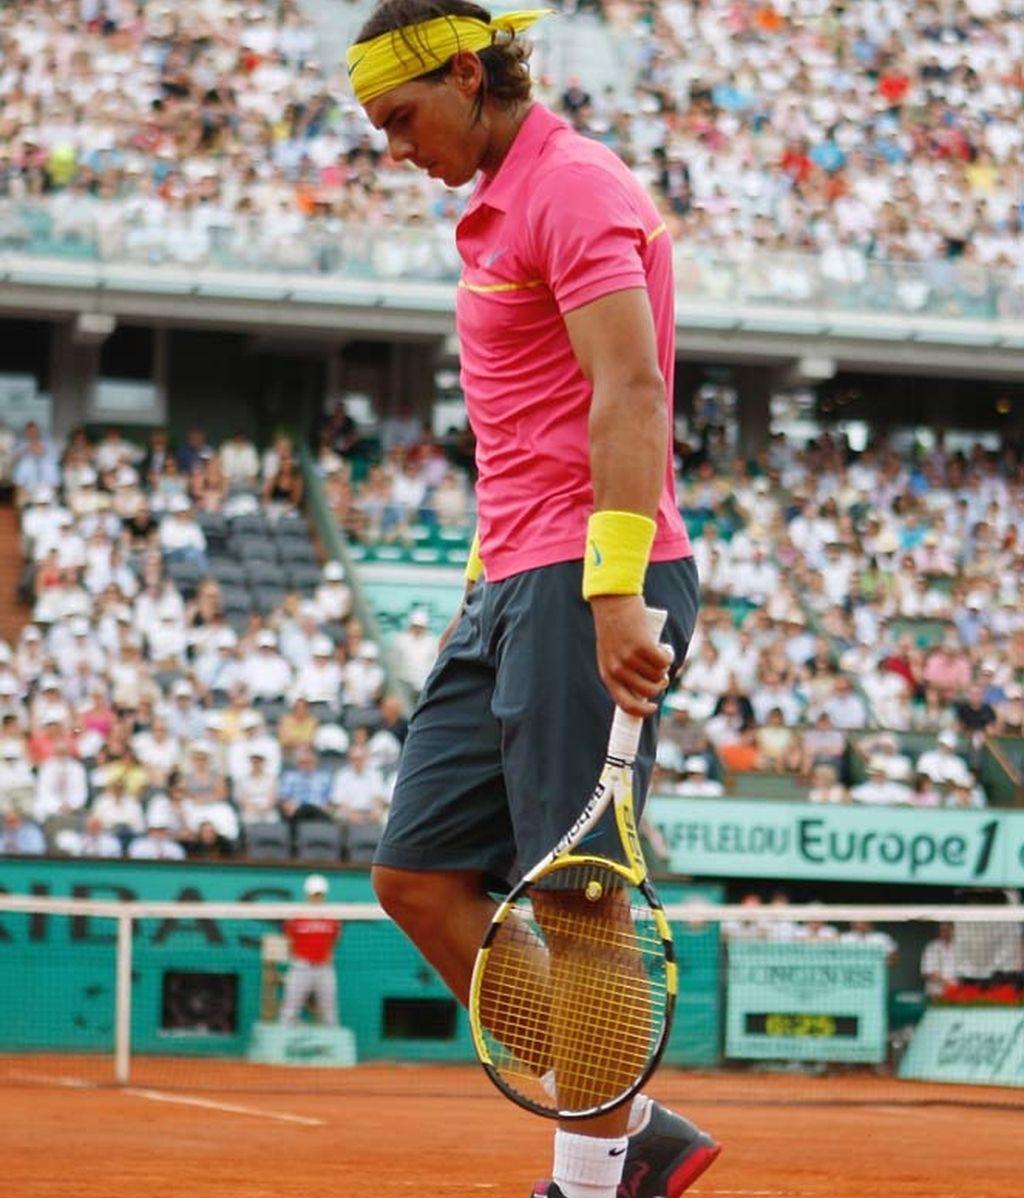 Derrota inesperada de Nadal en Roland Garros